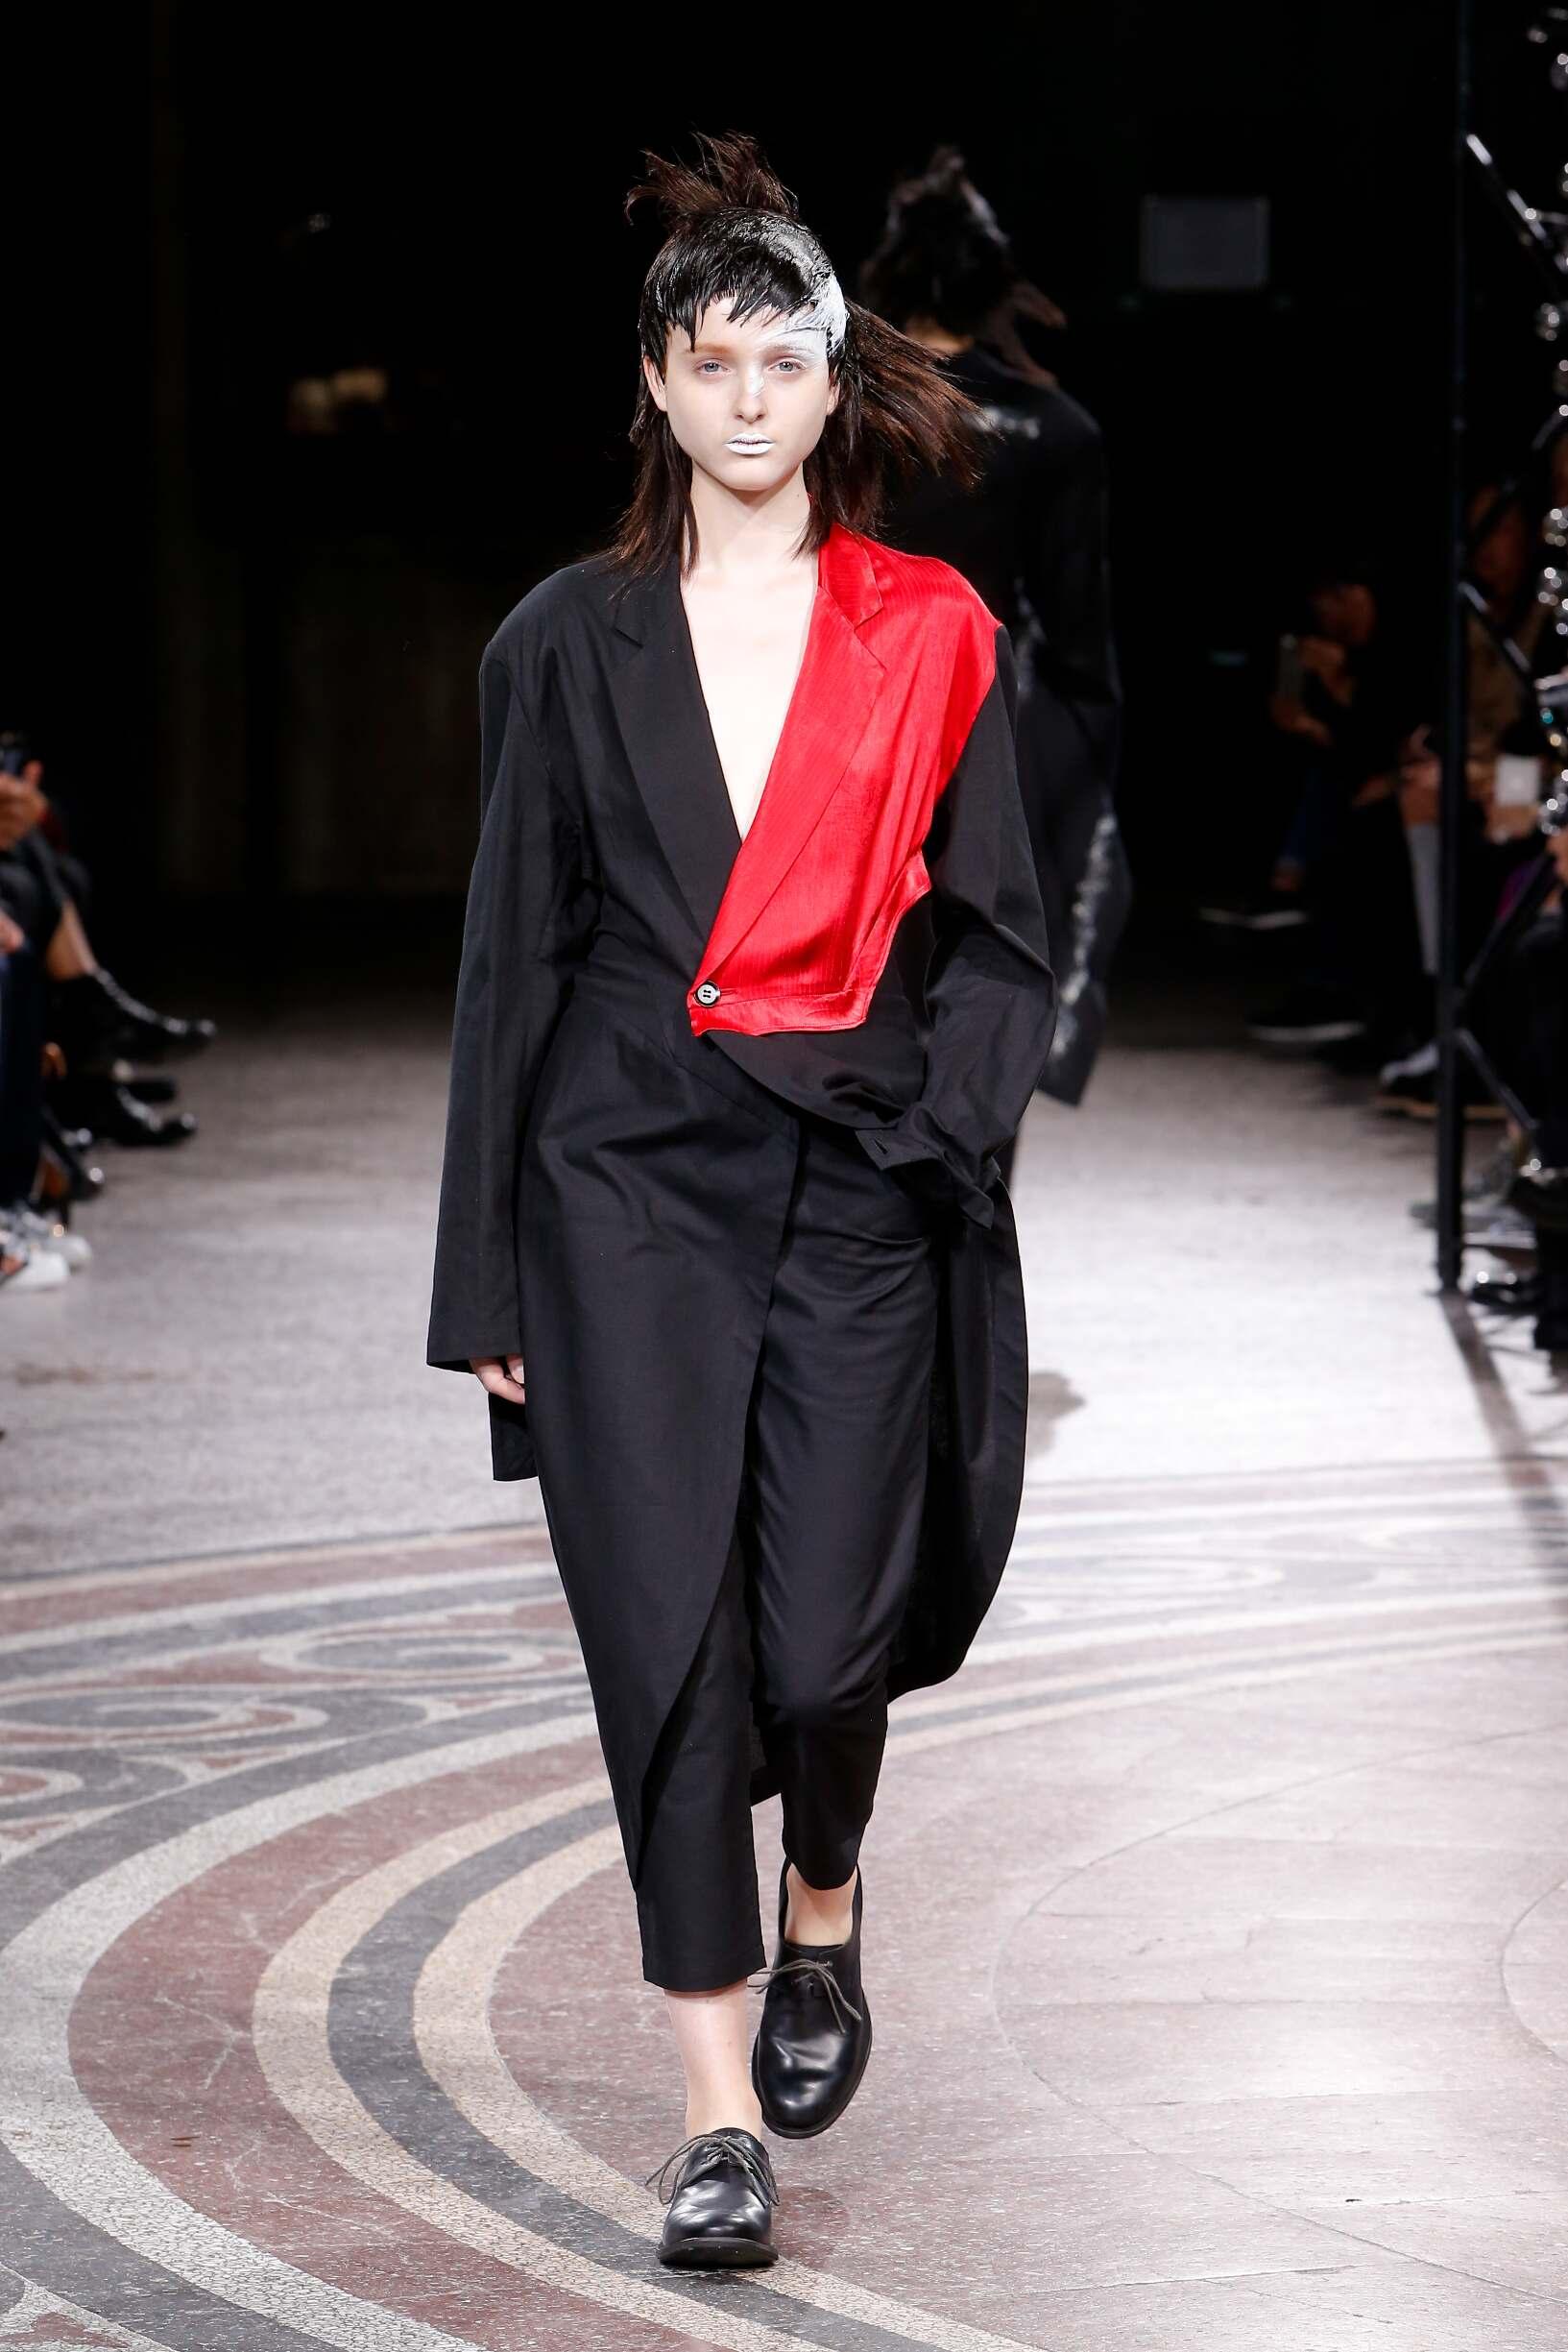 Spring Fashion Trends 2017 Yohji Yamamoto